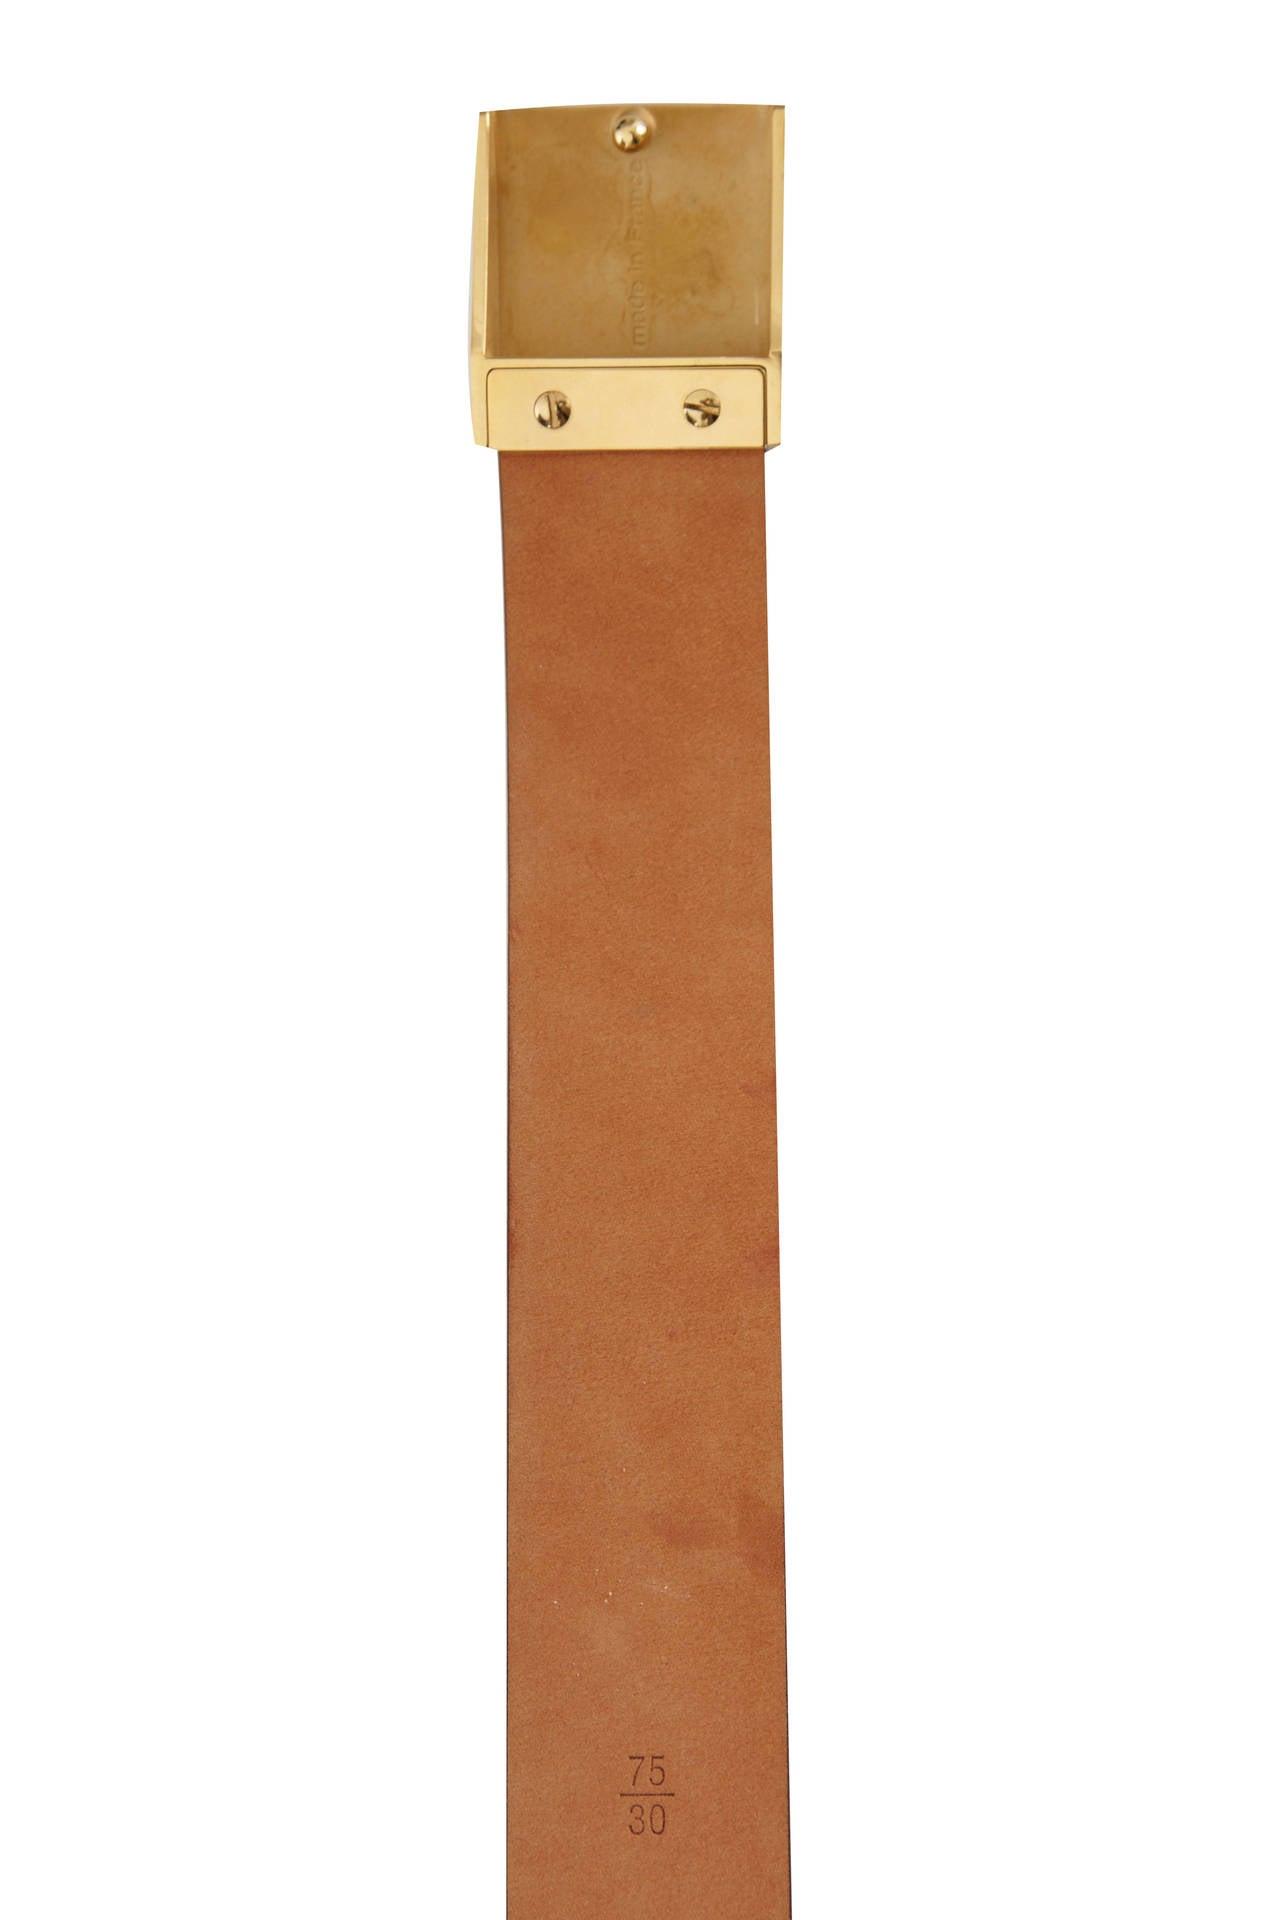 Louis Vuitton Monogram Belt 3